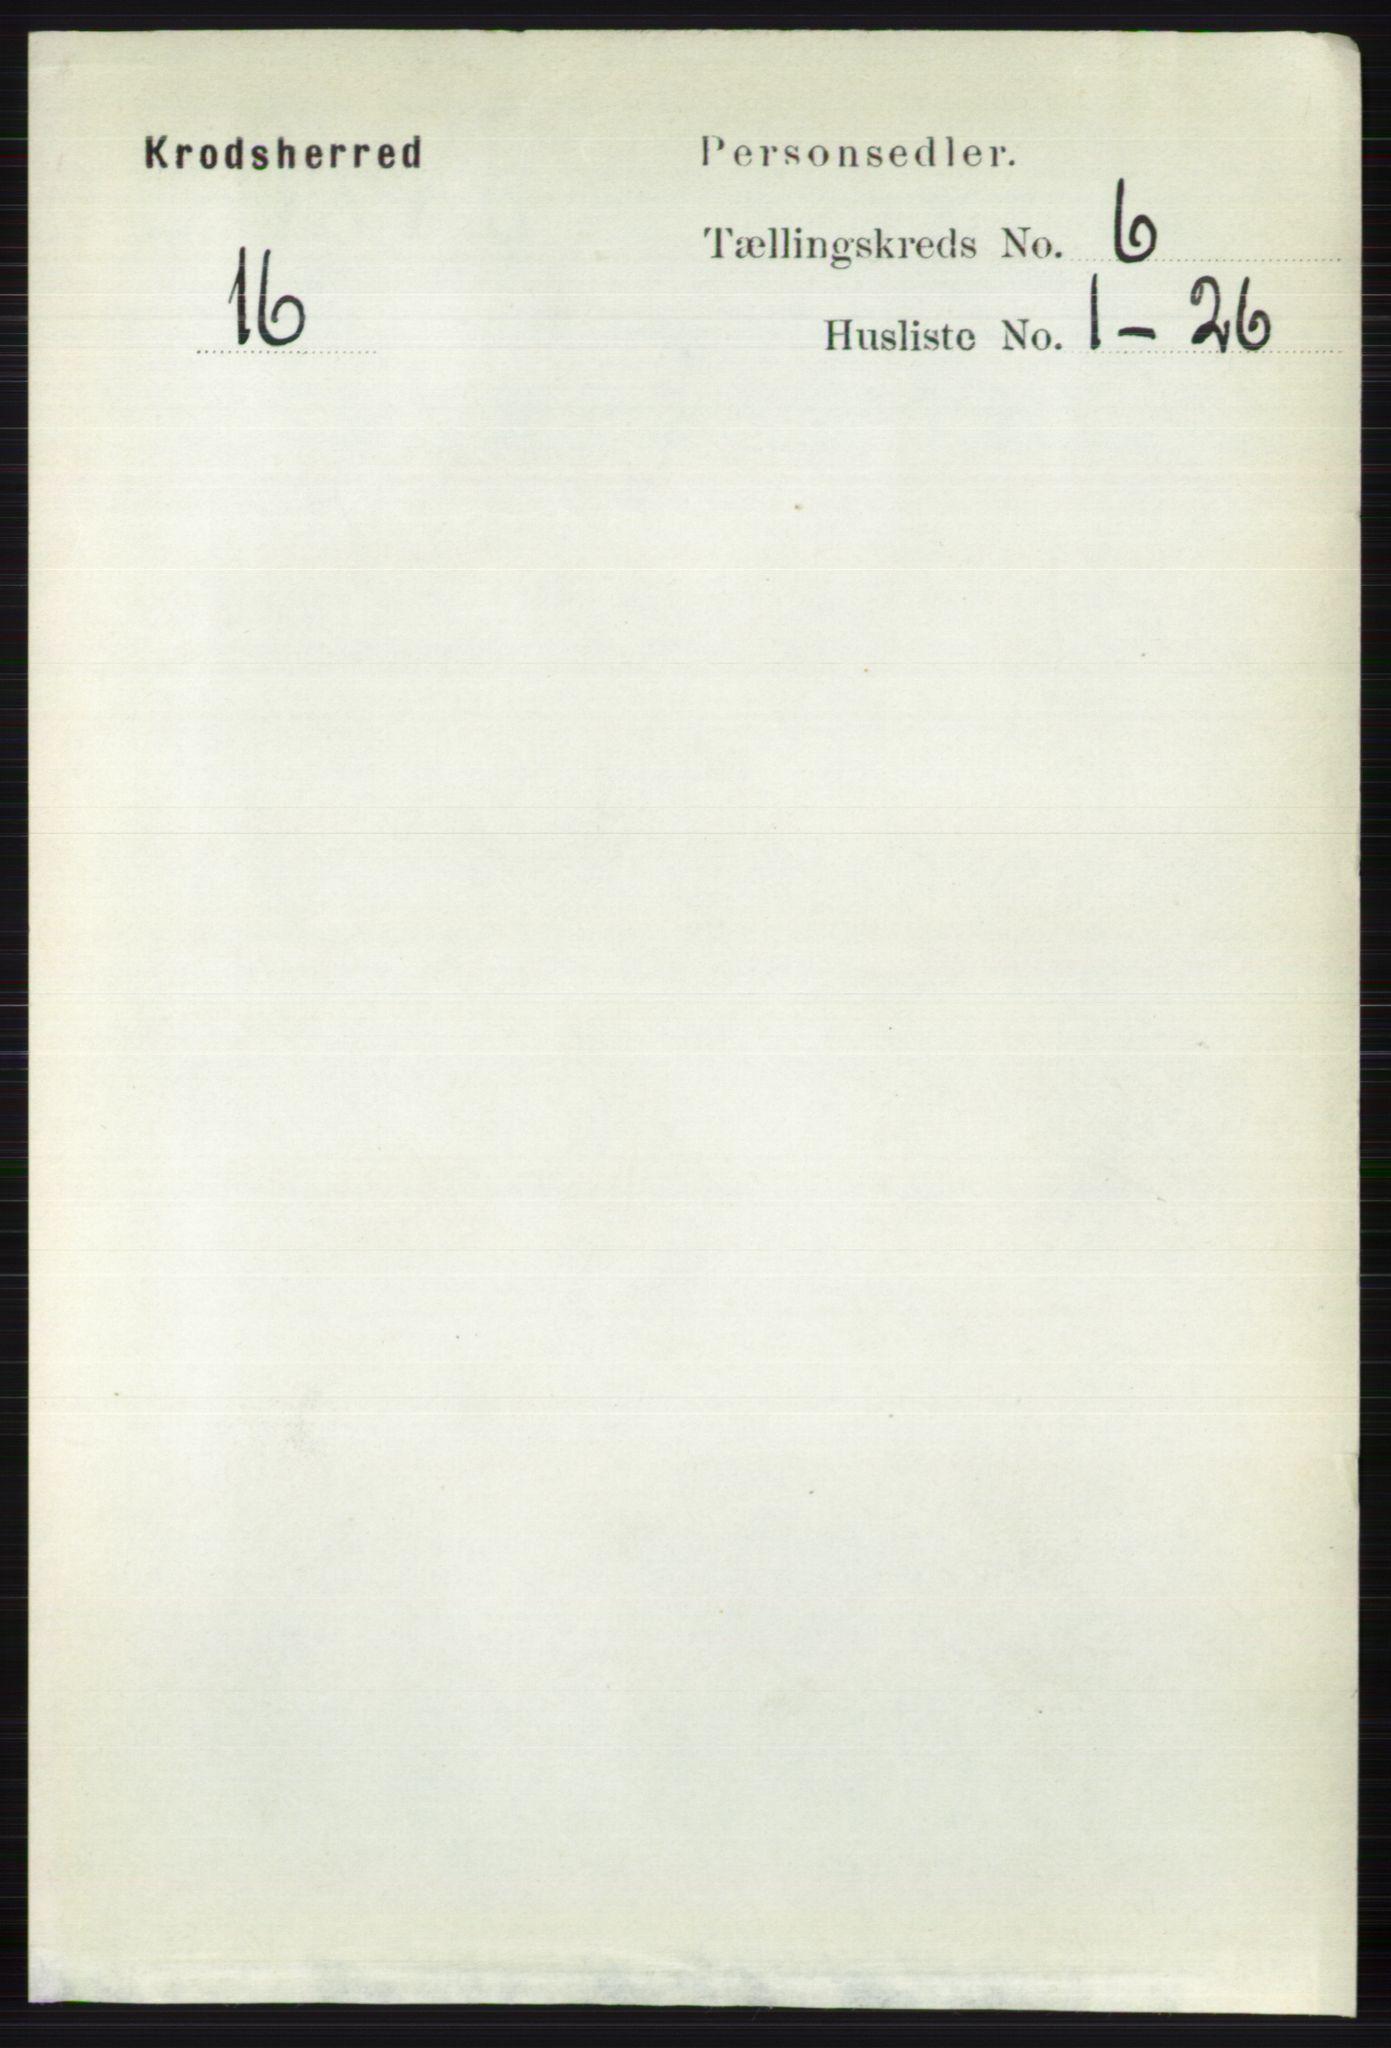 RA, Folketelling 1891 for 0621 Sigdal herred, 1891, s. 6632